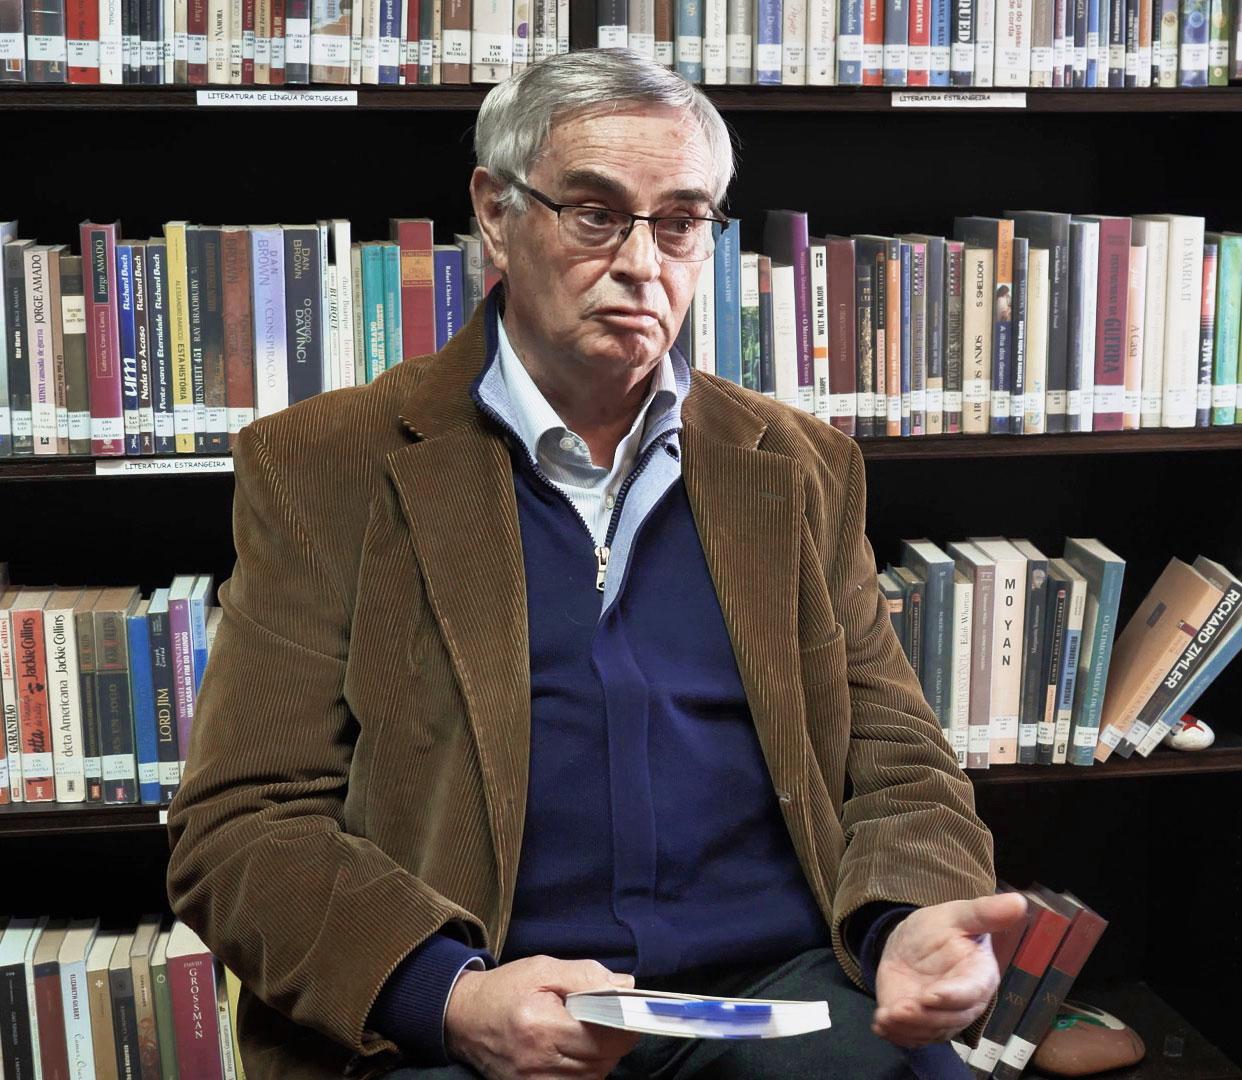 António Serra (CAL, CMMN, 2019)